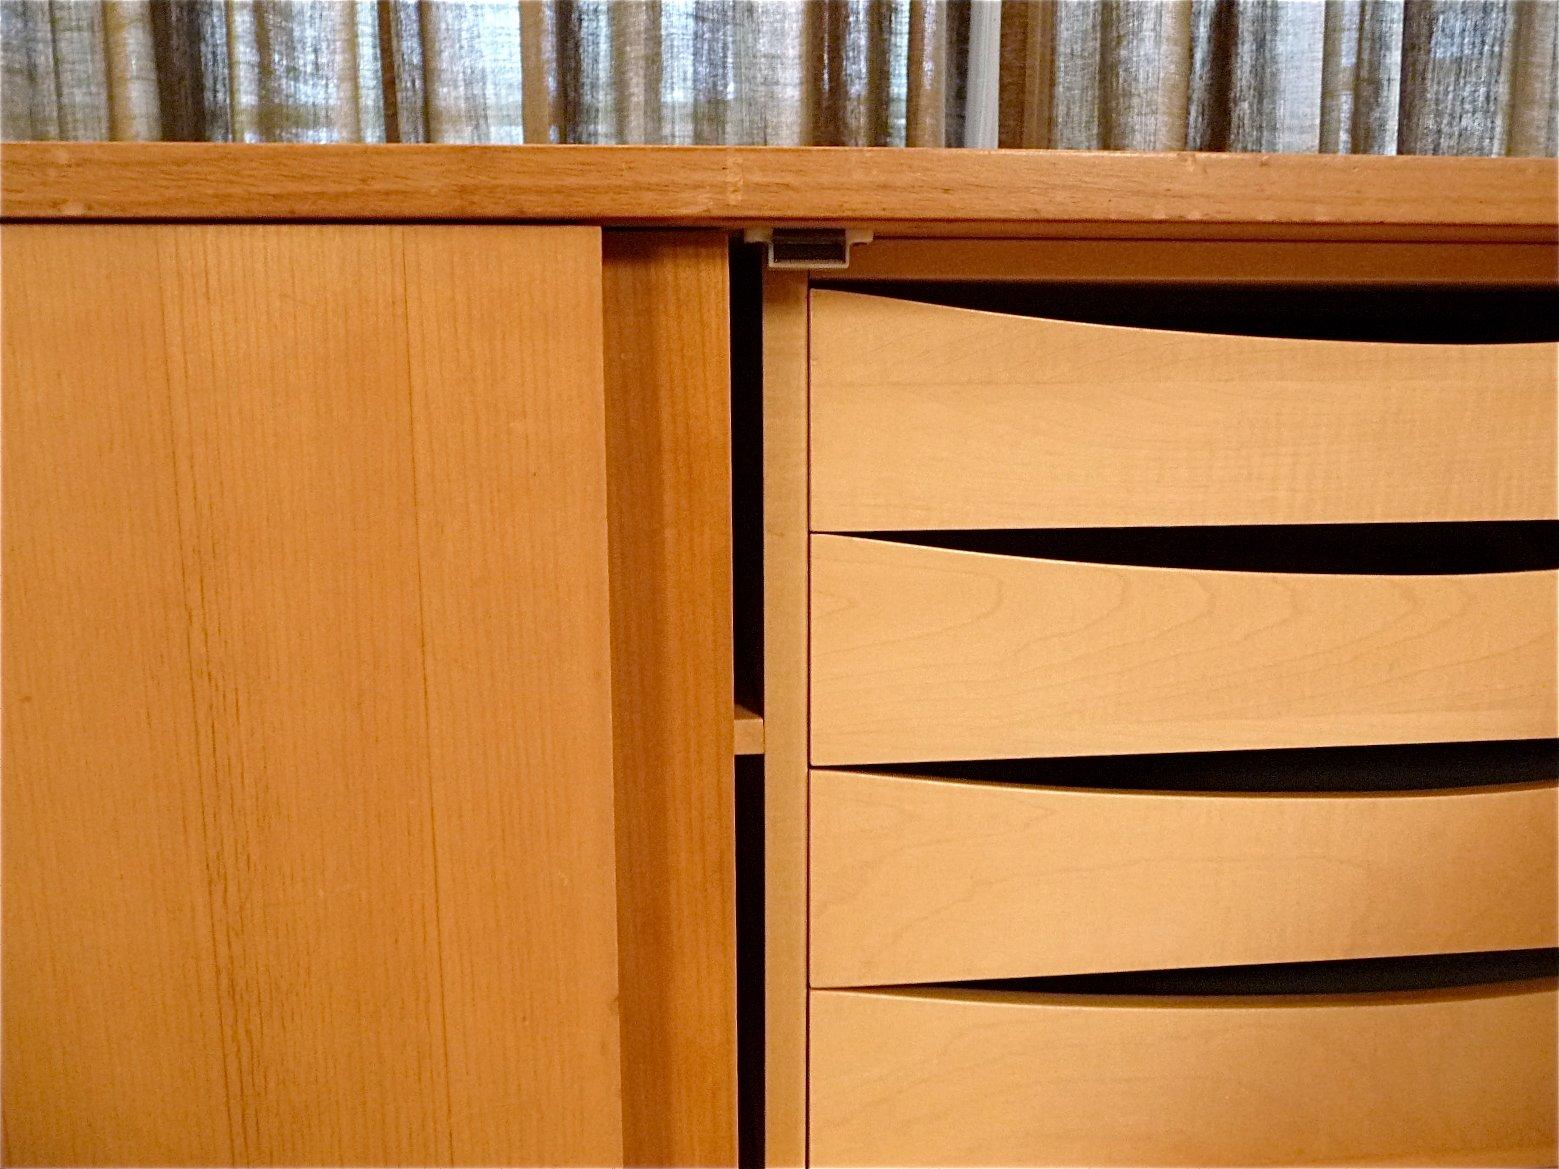 german large sideboard from wk m bel 1960s for sale at pamono. Black Bedroom Furniture Sets. Home Design Ideas